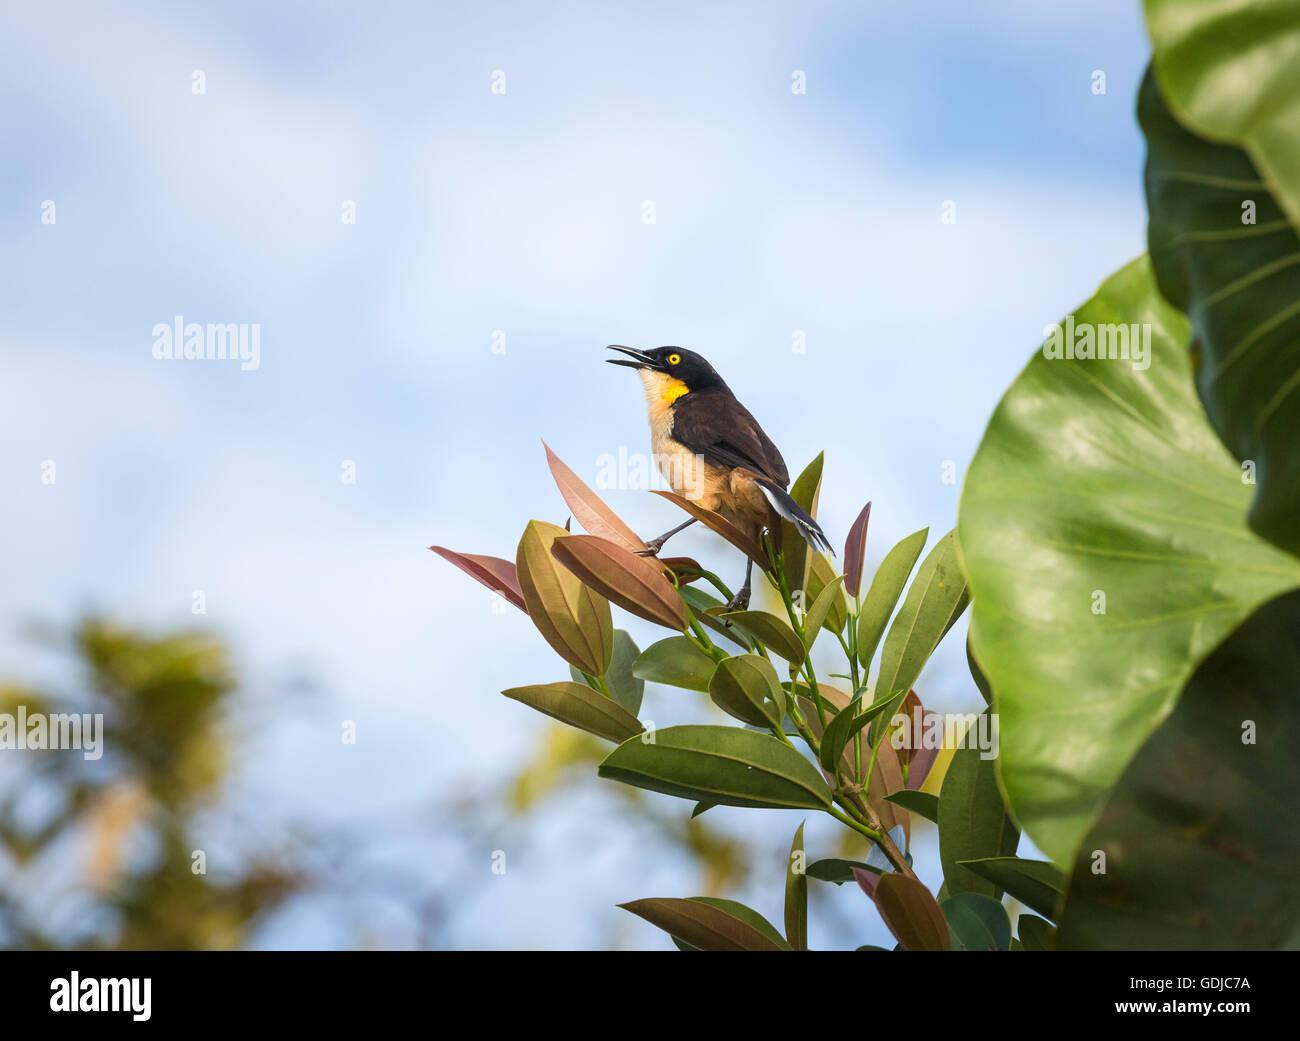 Black-capped donacobius (Donacobius atricapilla), Amazonian tropical rain forest at La Selva lodge on the Napo River, Stock Photo